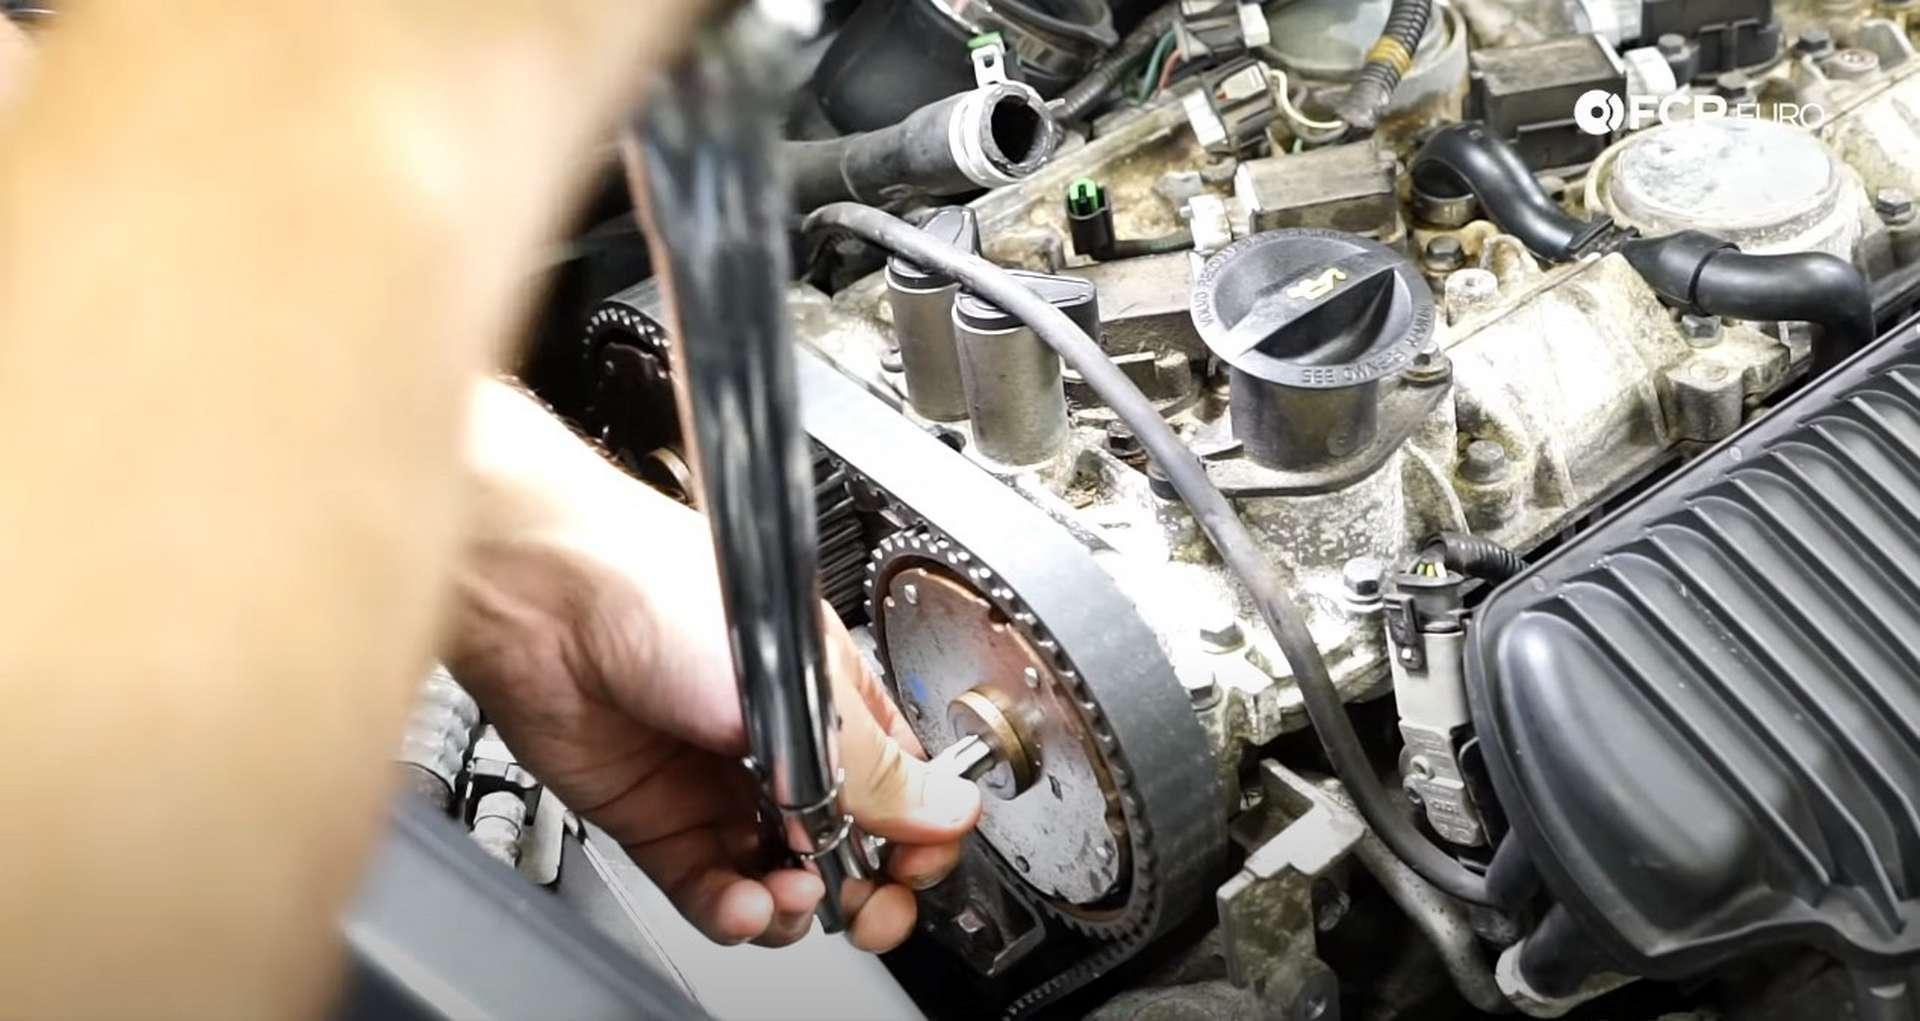 DIY Volvo P1 Water Pump Replacement torquing the cam sprocket plugs